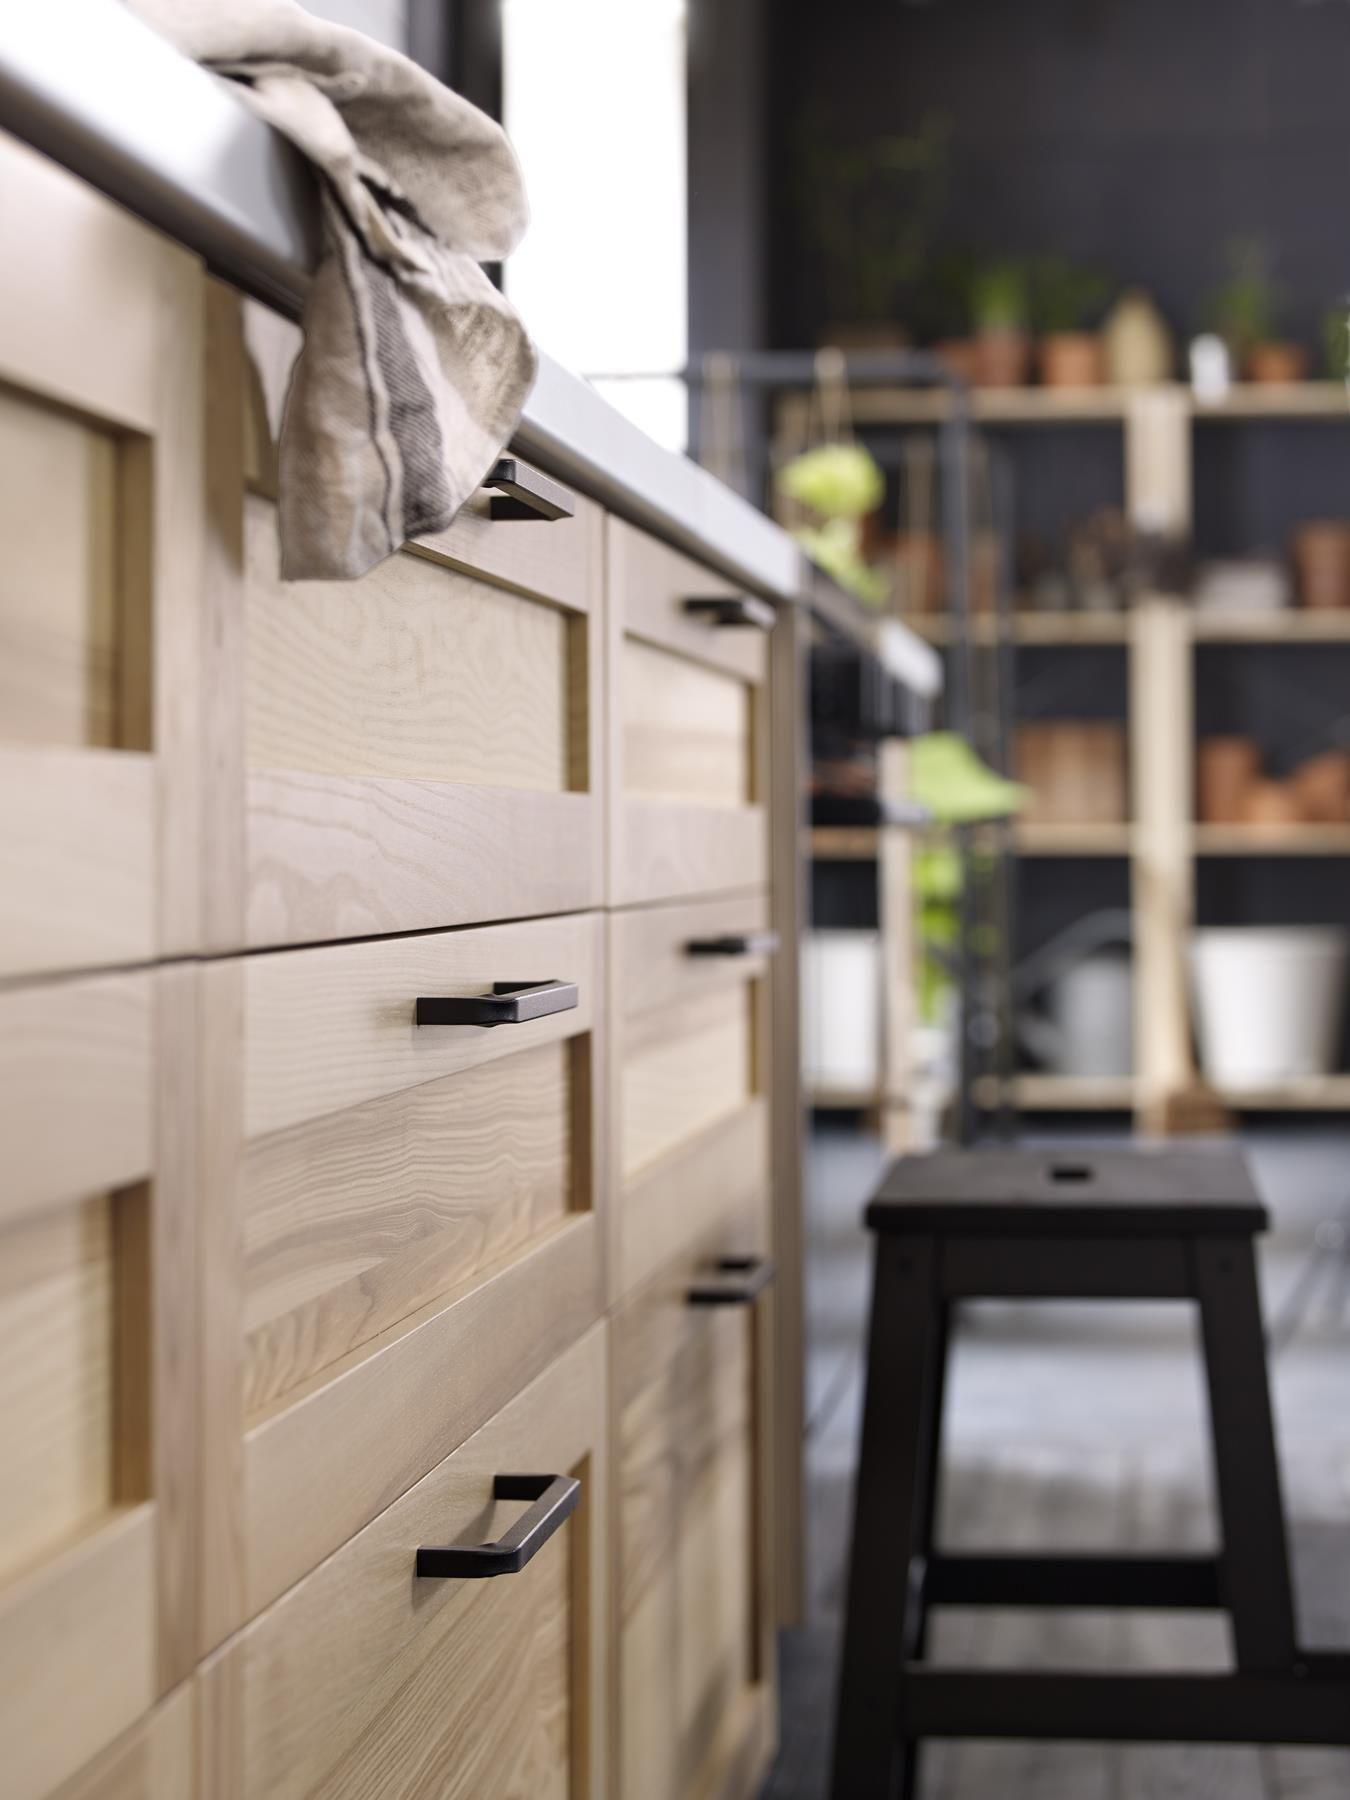 Küchen türen ikea  Diez propósitos de AÑO NUEVO en tu cocina | Pinterest